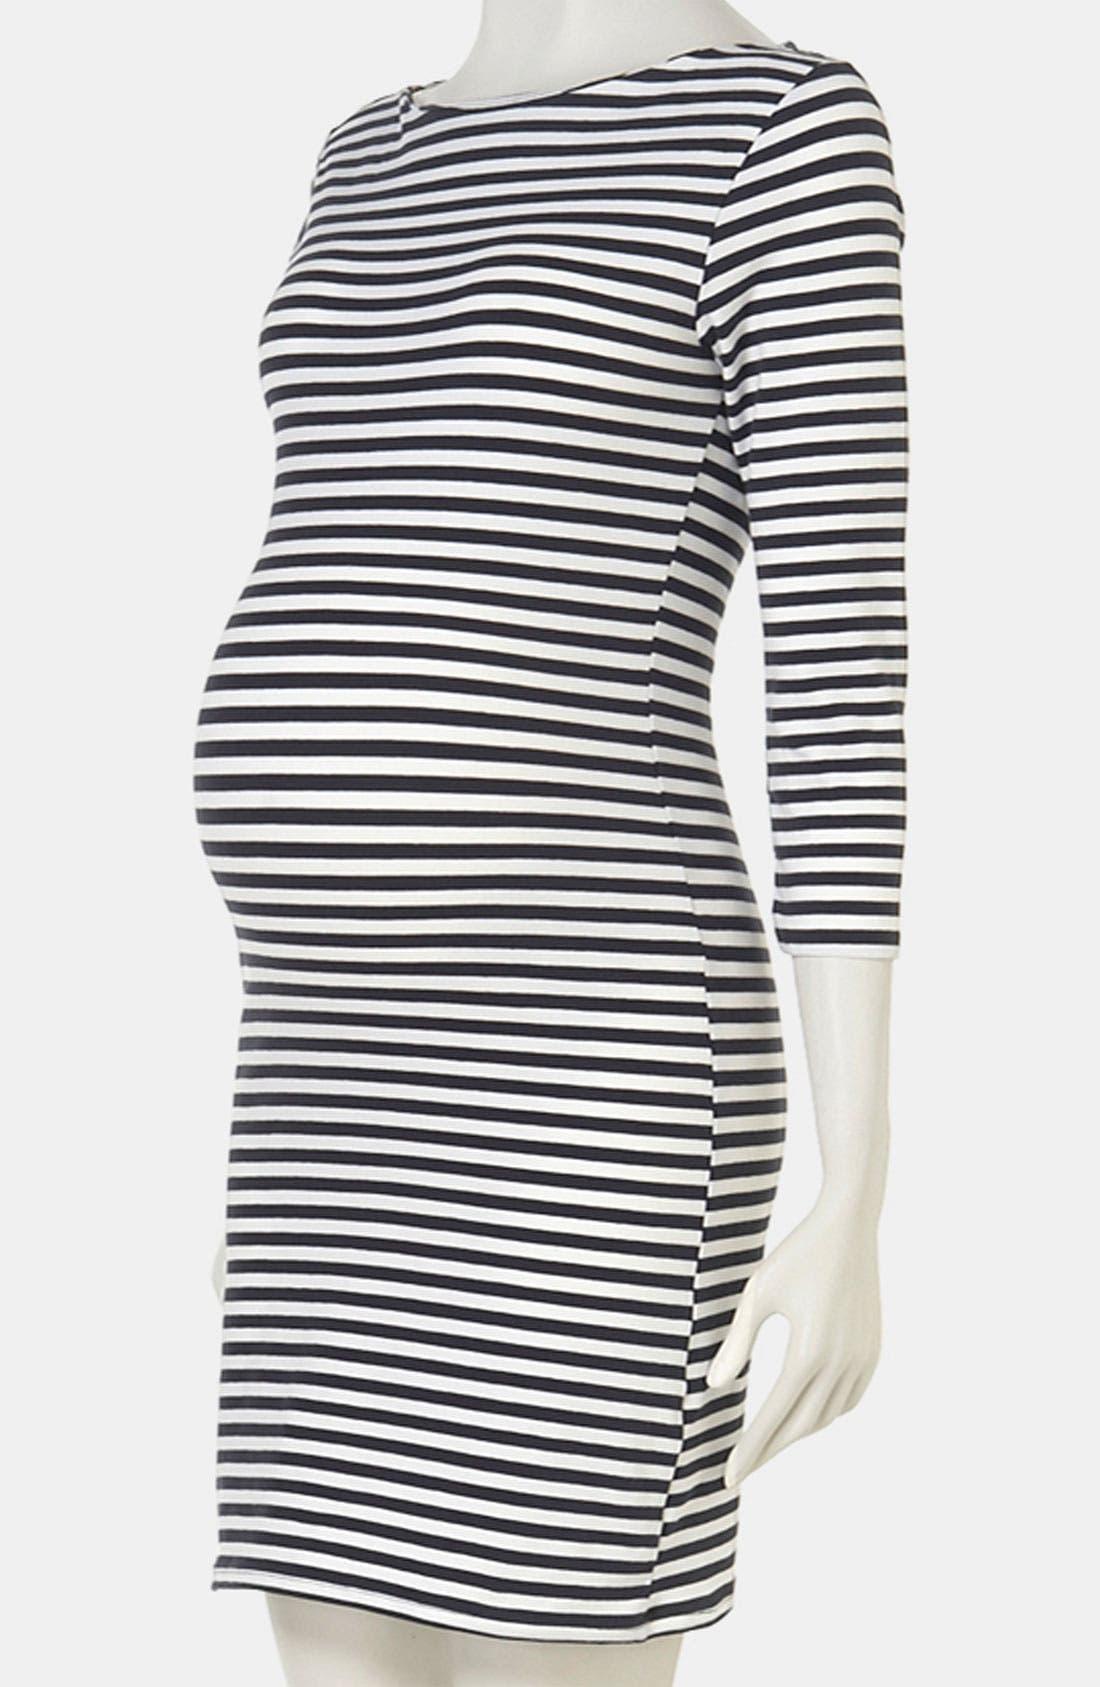 Alternate Image 1 Selected - Topshop Stripe Maternity Dress